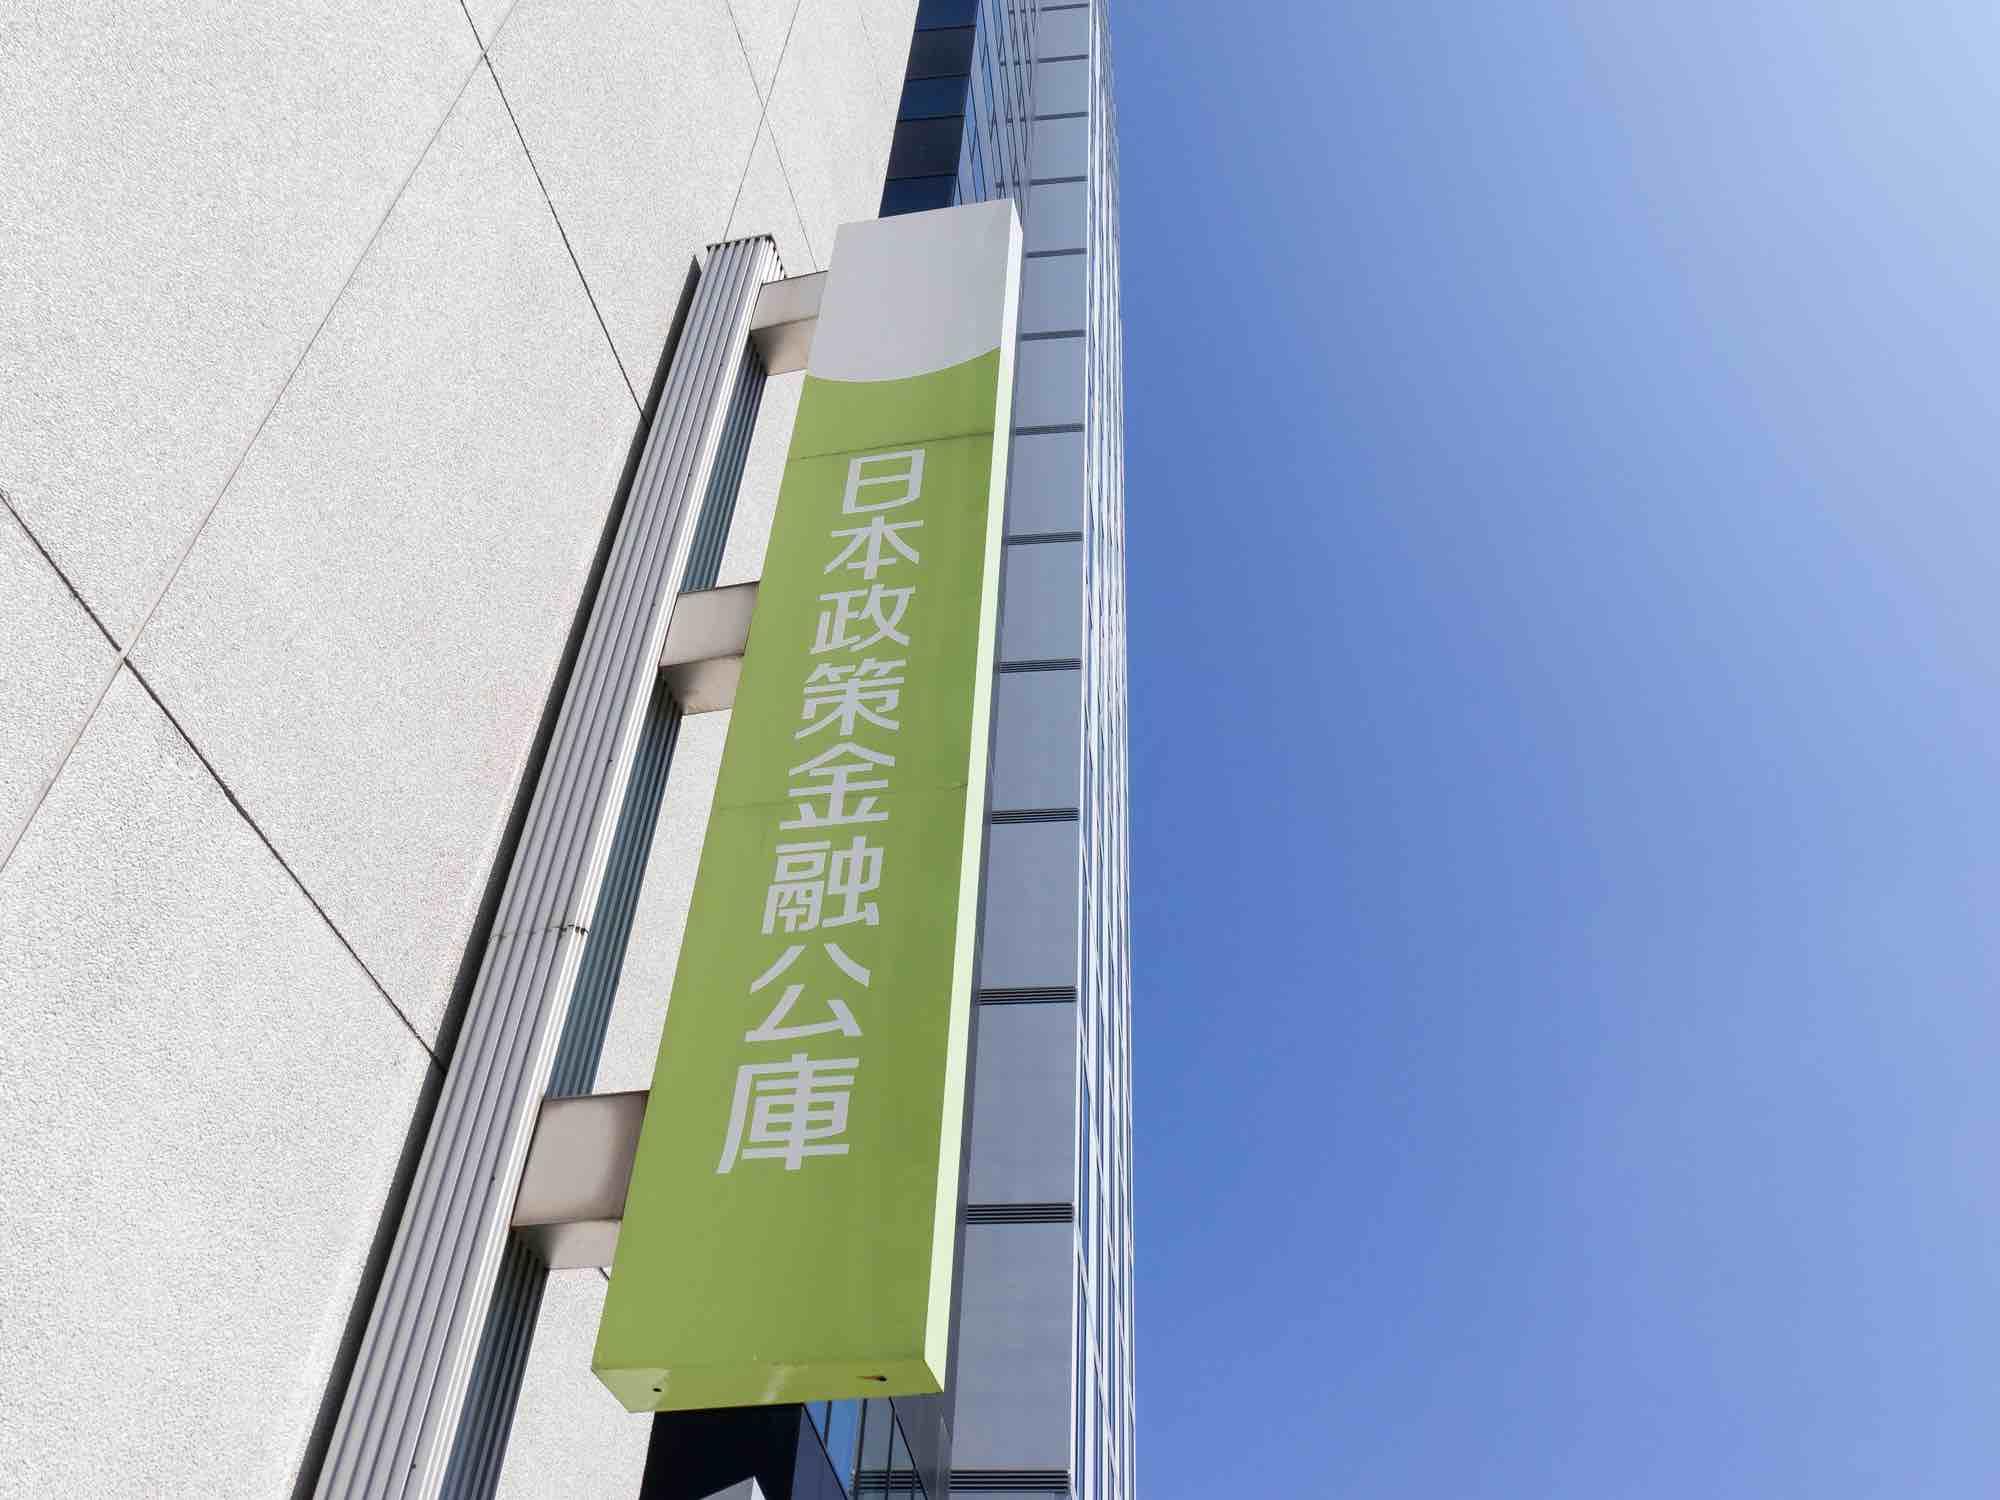 日本政策金融公庫の融資